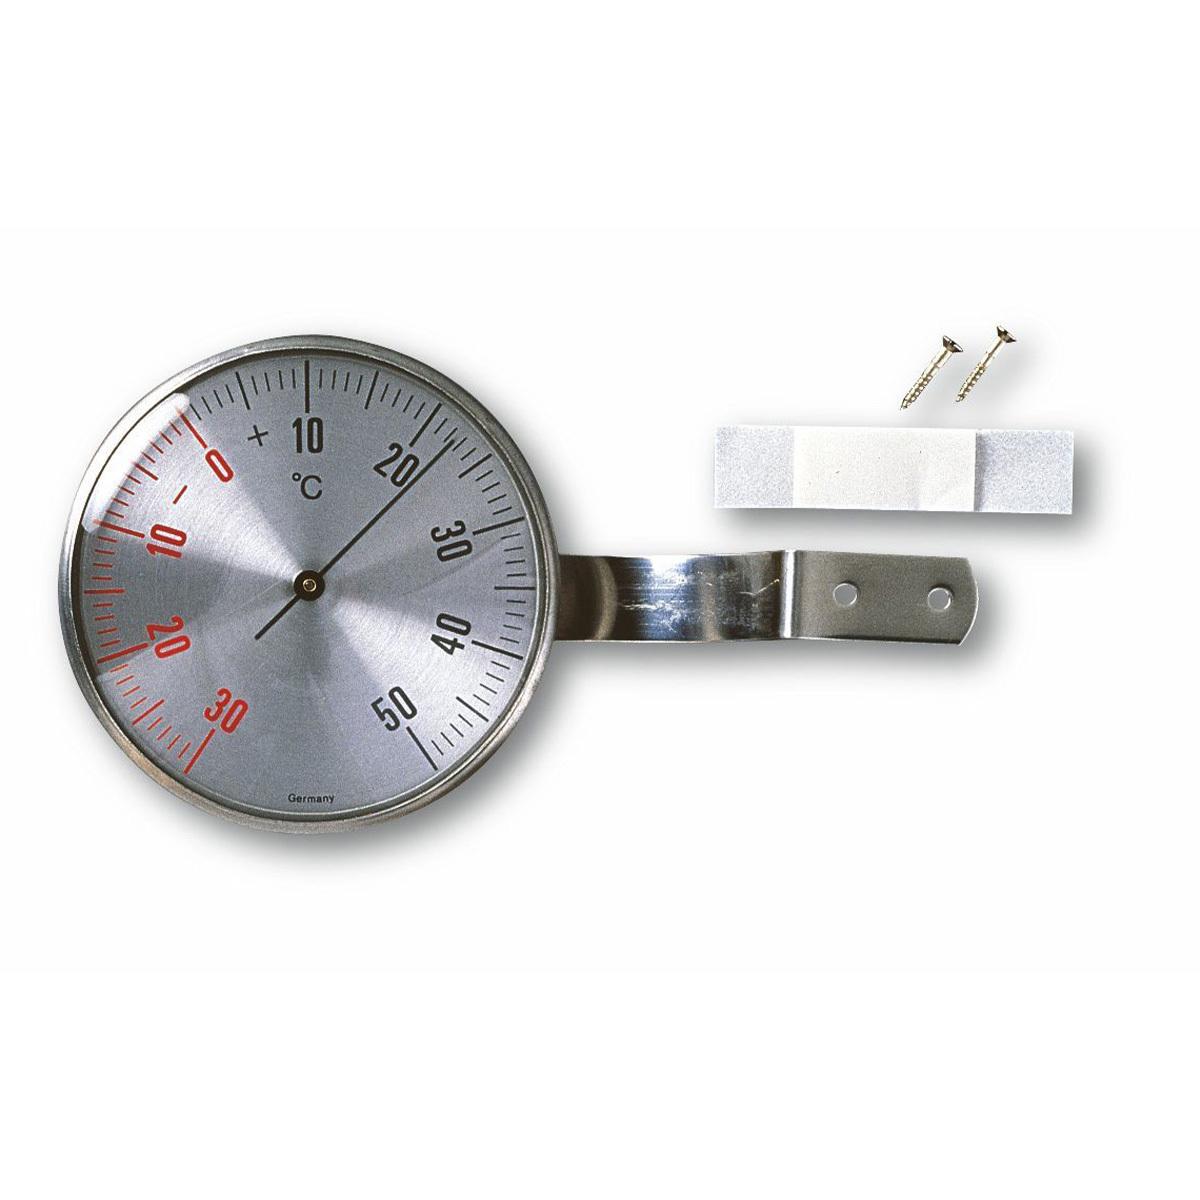 14-5001-analoges-fensterthermometer-1200x1200px.jpg